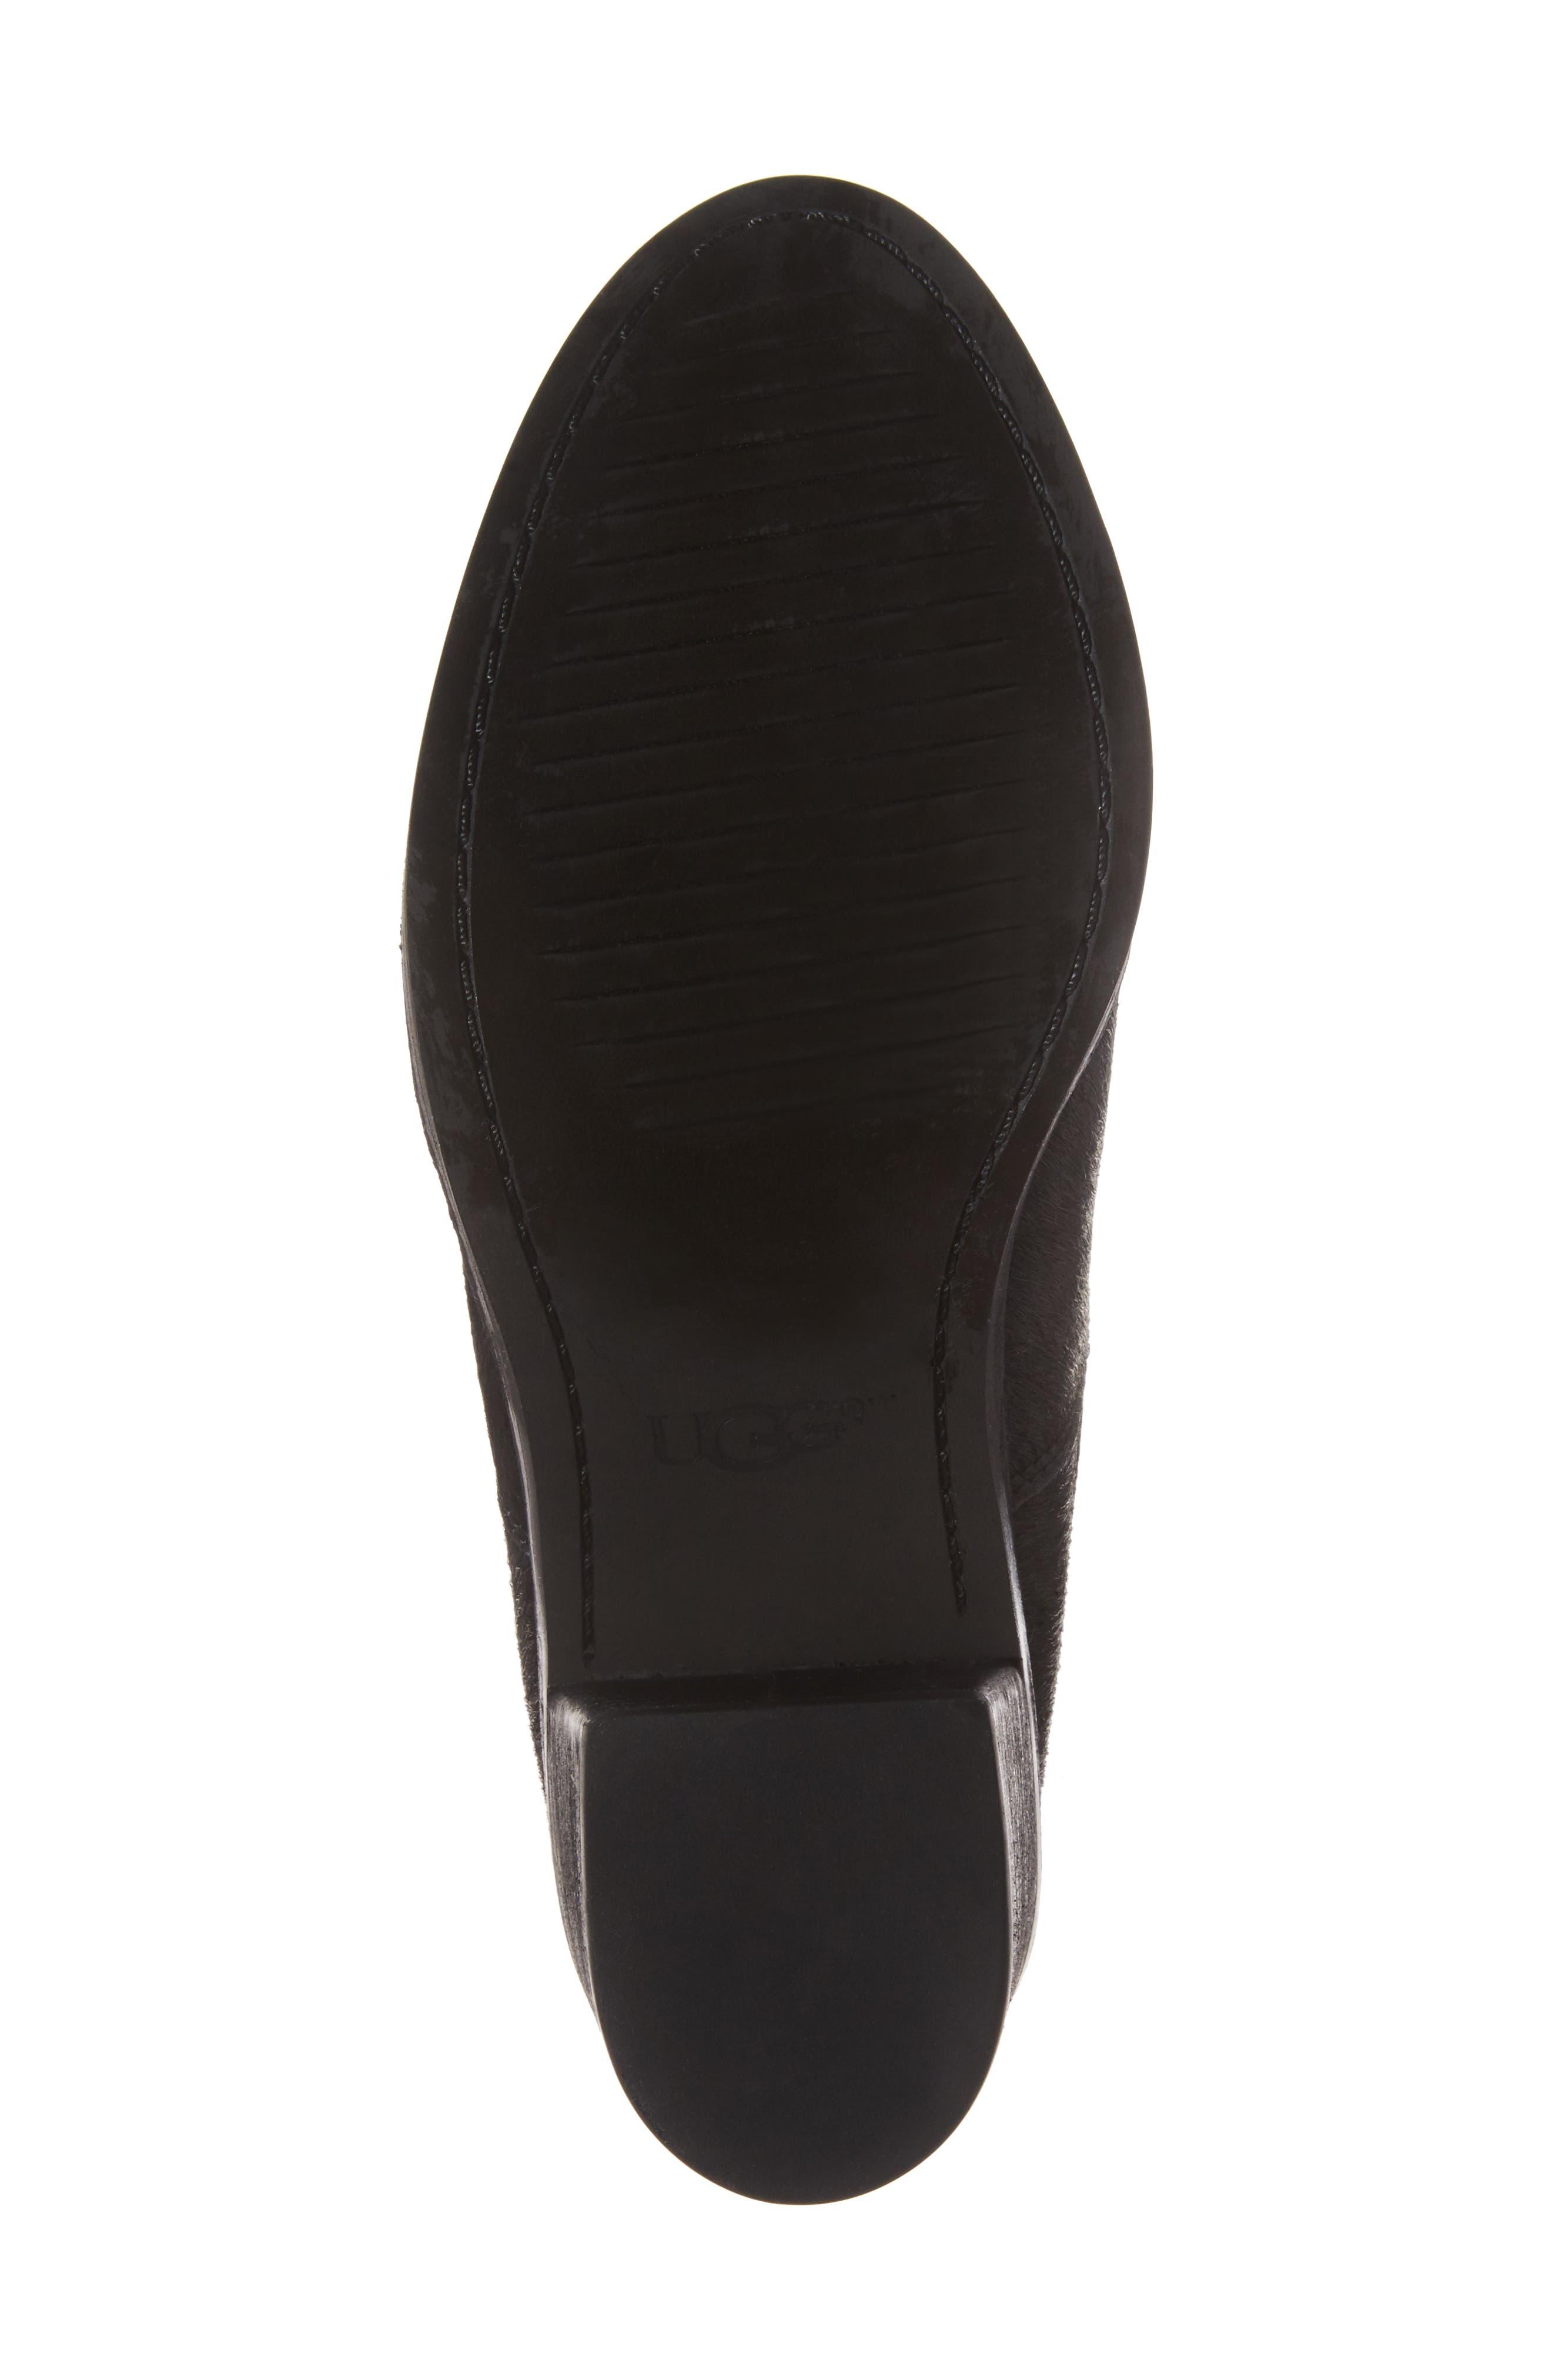 Camden Genuine Calf Hair Chelsea Boot,                             Alternate thumbnail 6, color,                             Black Calf Hair Leather